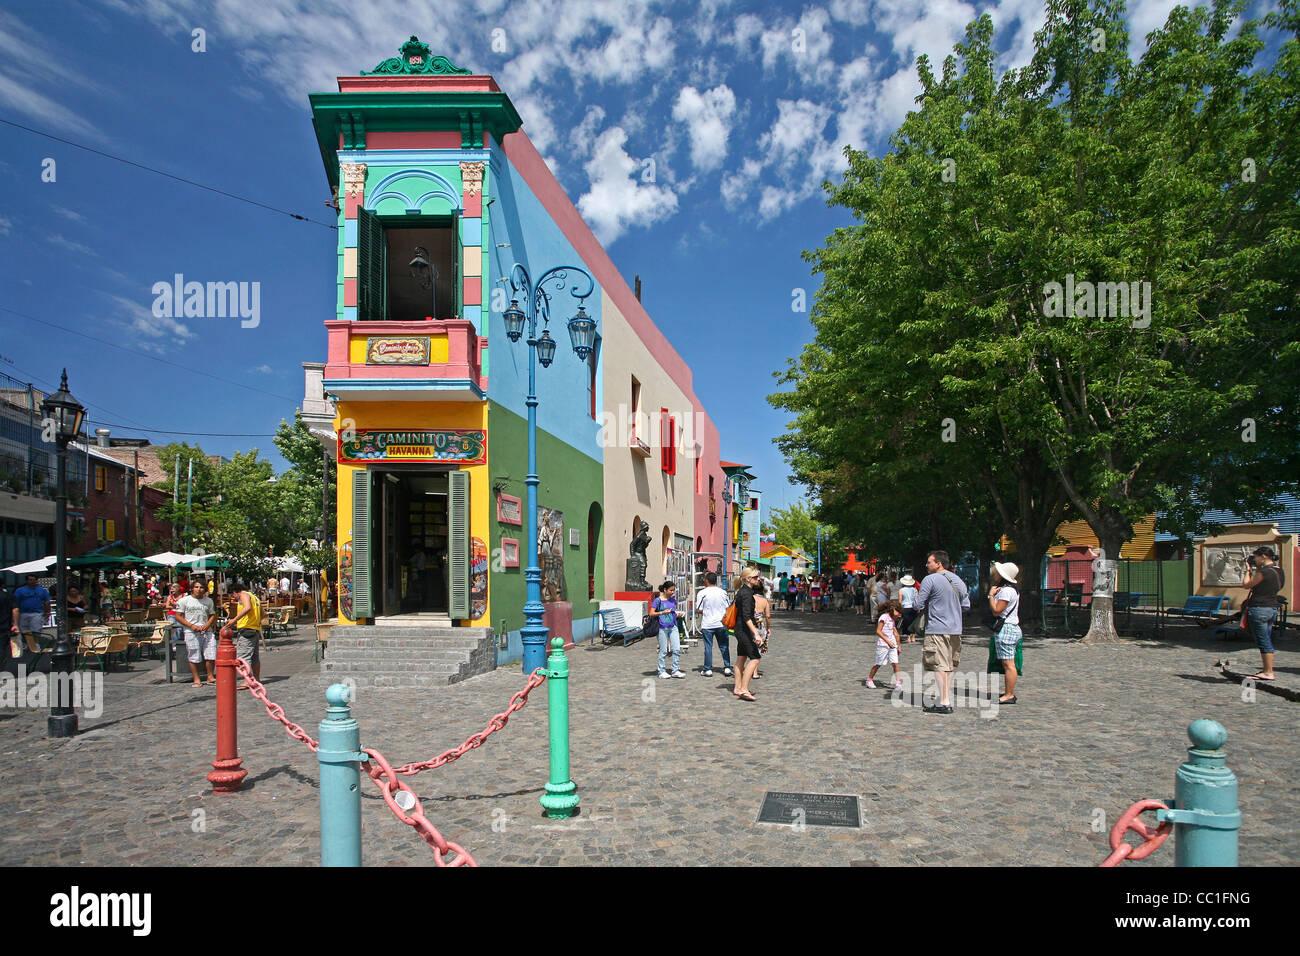 Le Caminito tango de lore dans le barrio de La Boca, Buenos Aires, Argentine Photo Stock